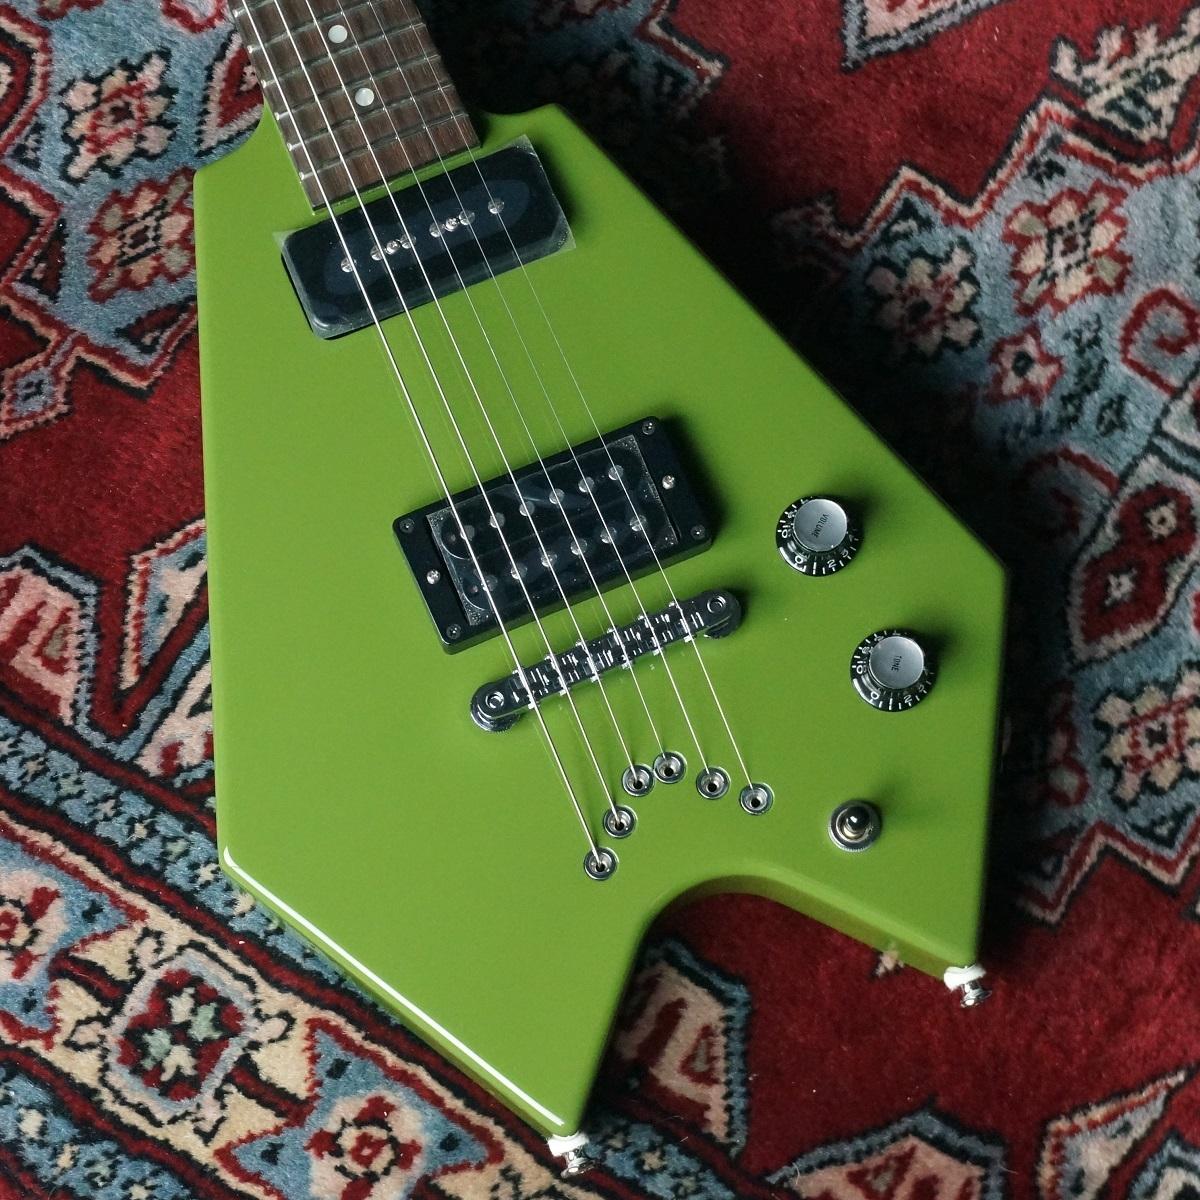 Crews Maniac Sound Fallin' Angel Olive 【軽量ボディを採用したクルーズ渾身の国産コンパクトギター。】